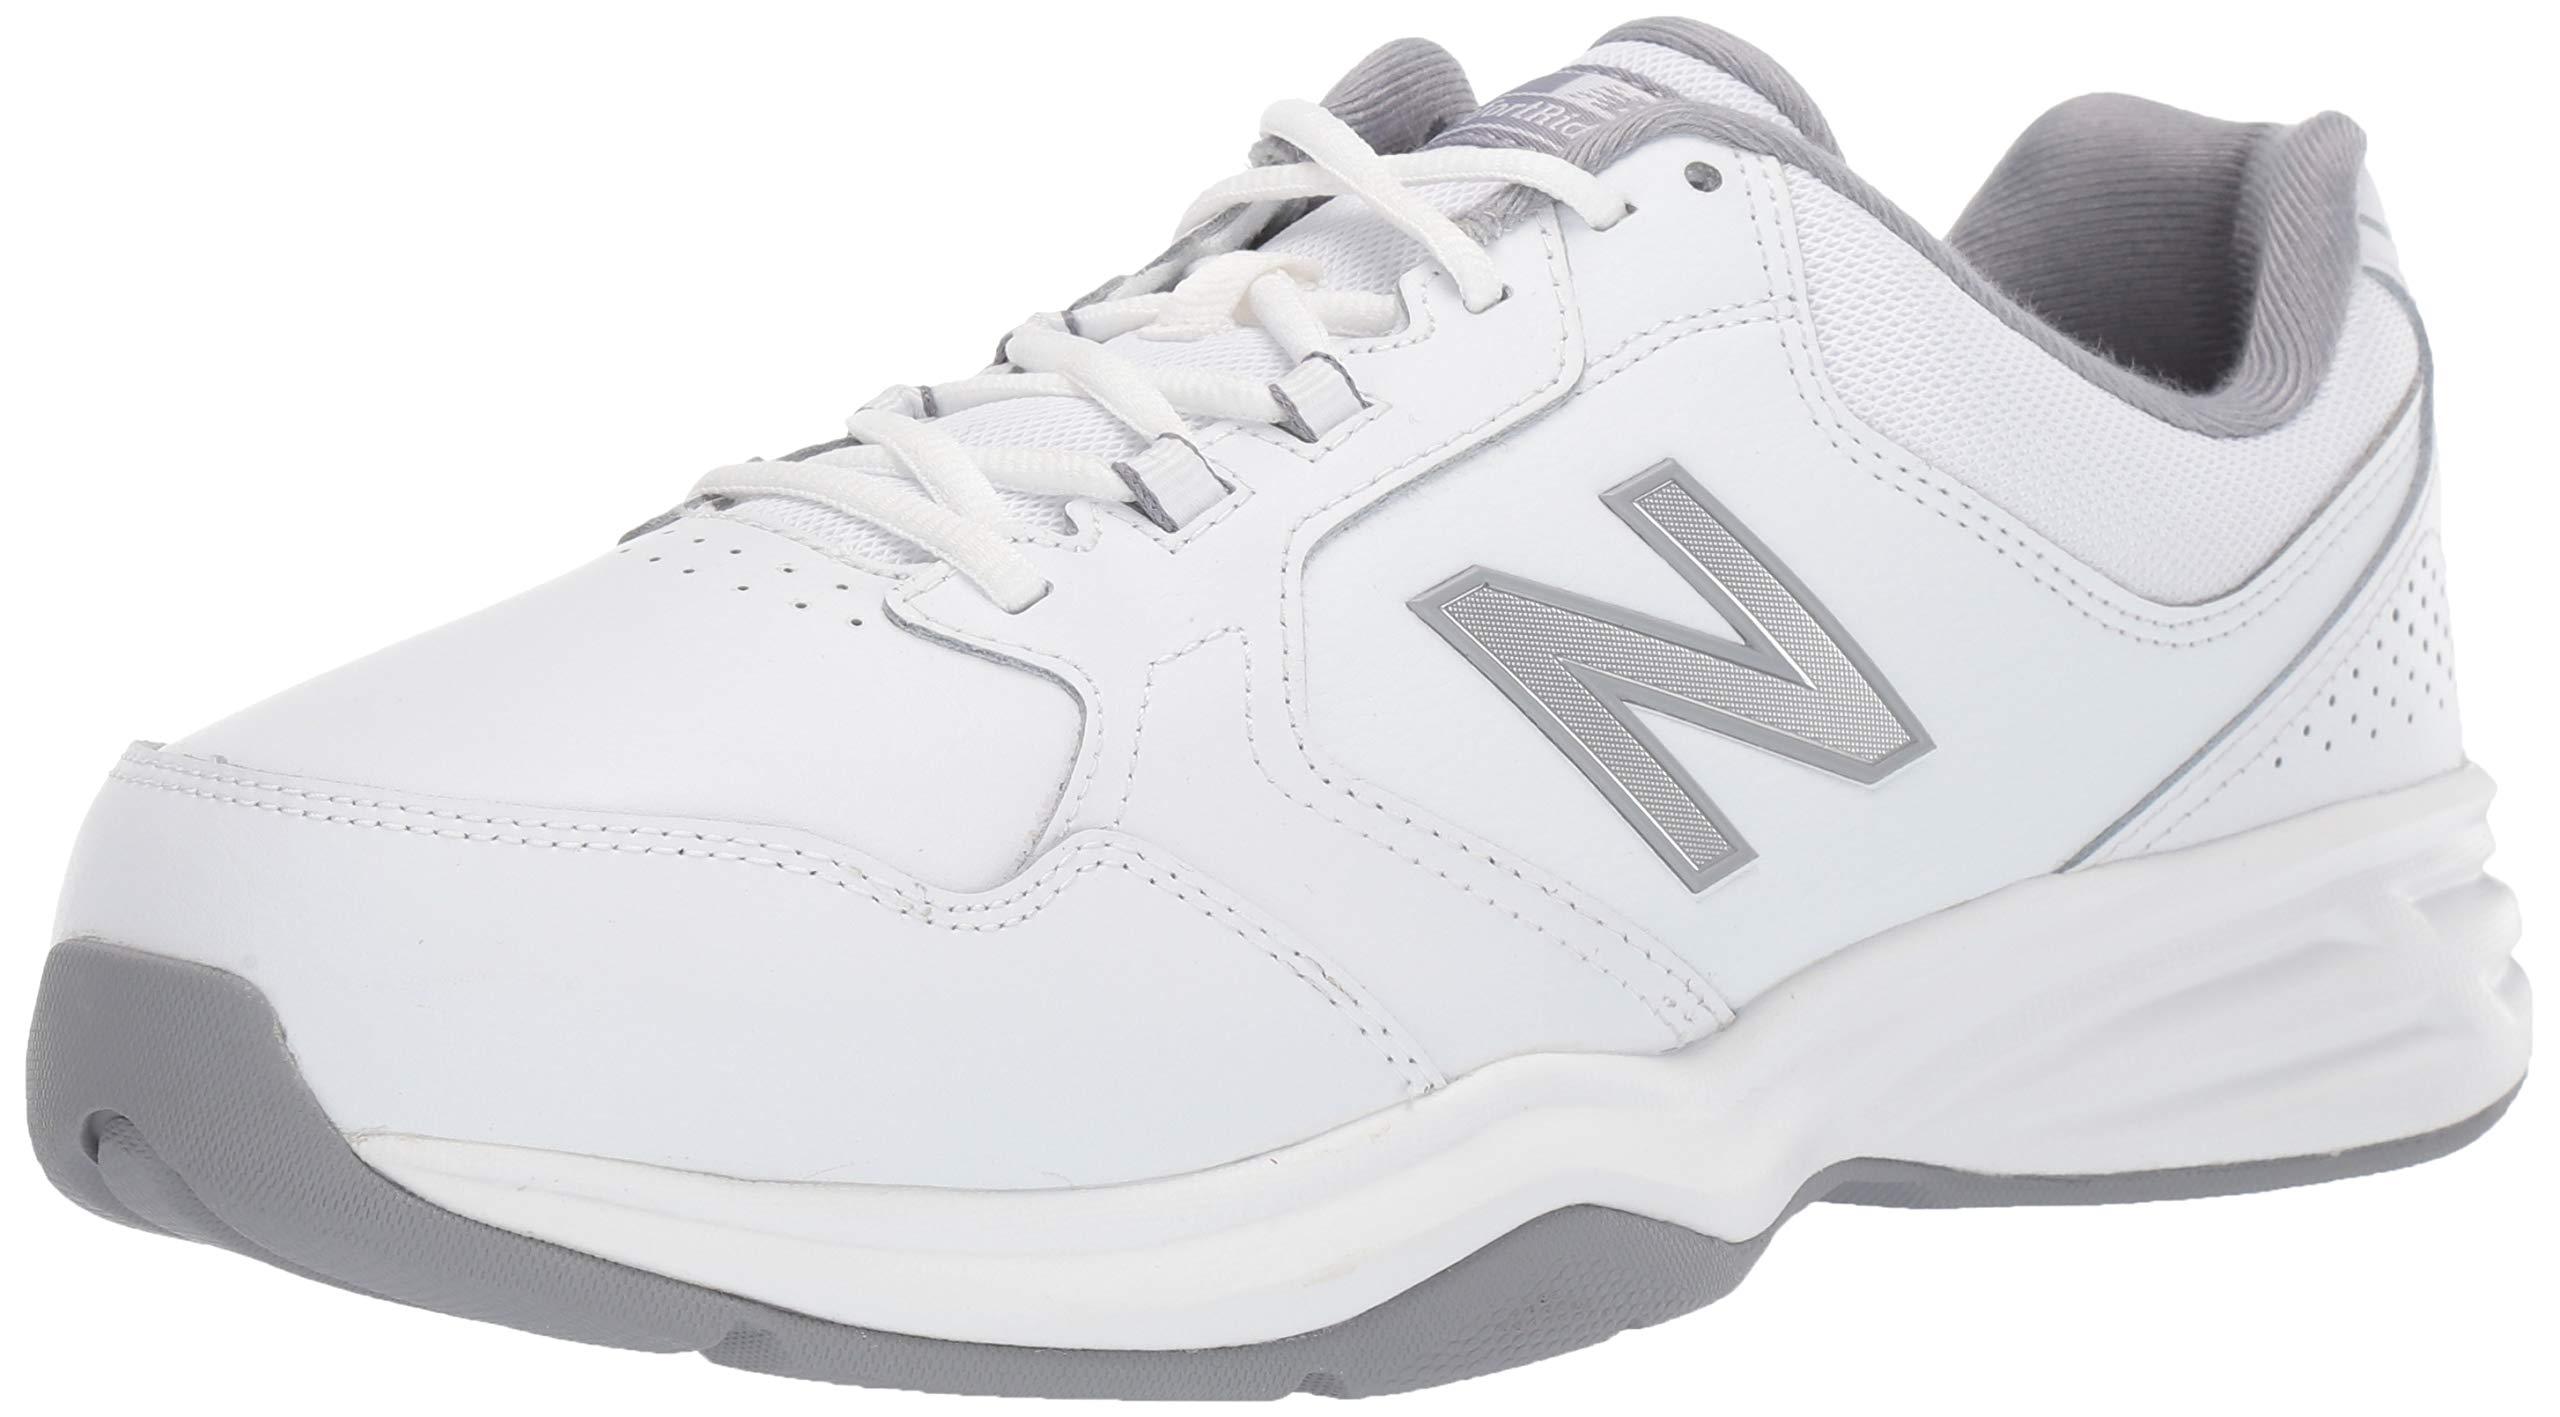 New Balance Men's 411v1 Running Shoe, White/Silver Mink, 10.5 2E US by New Balance